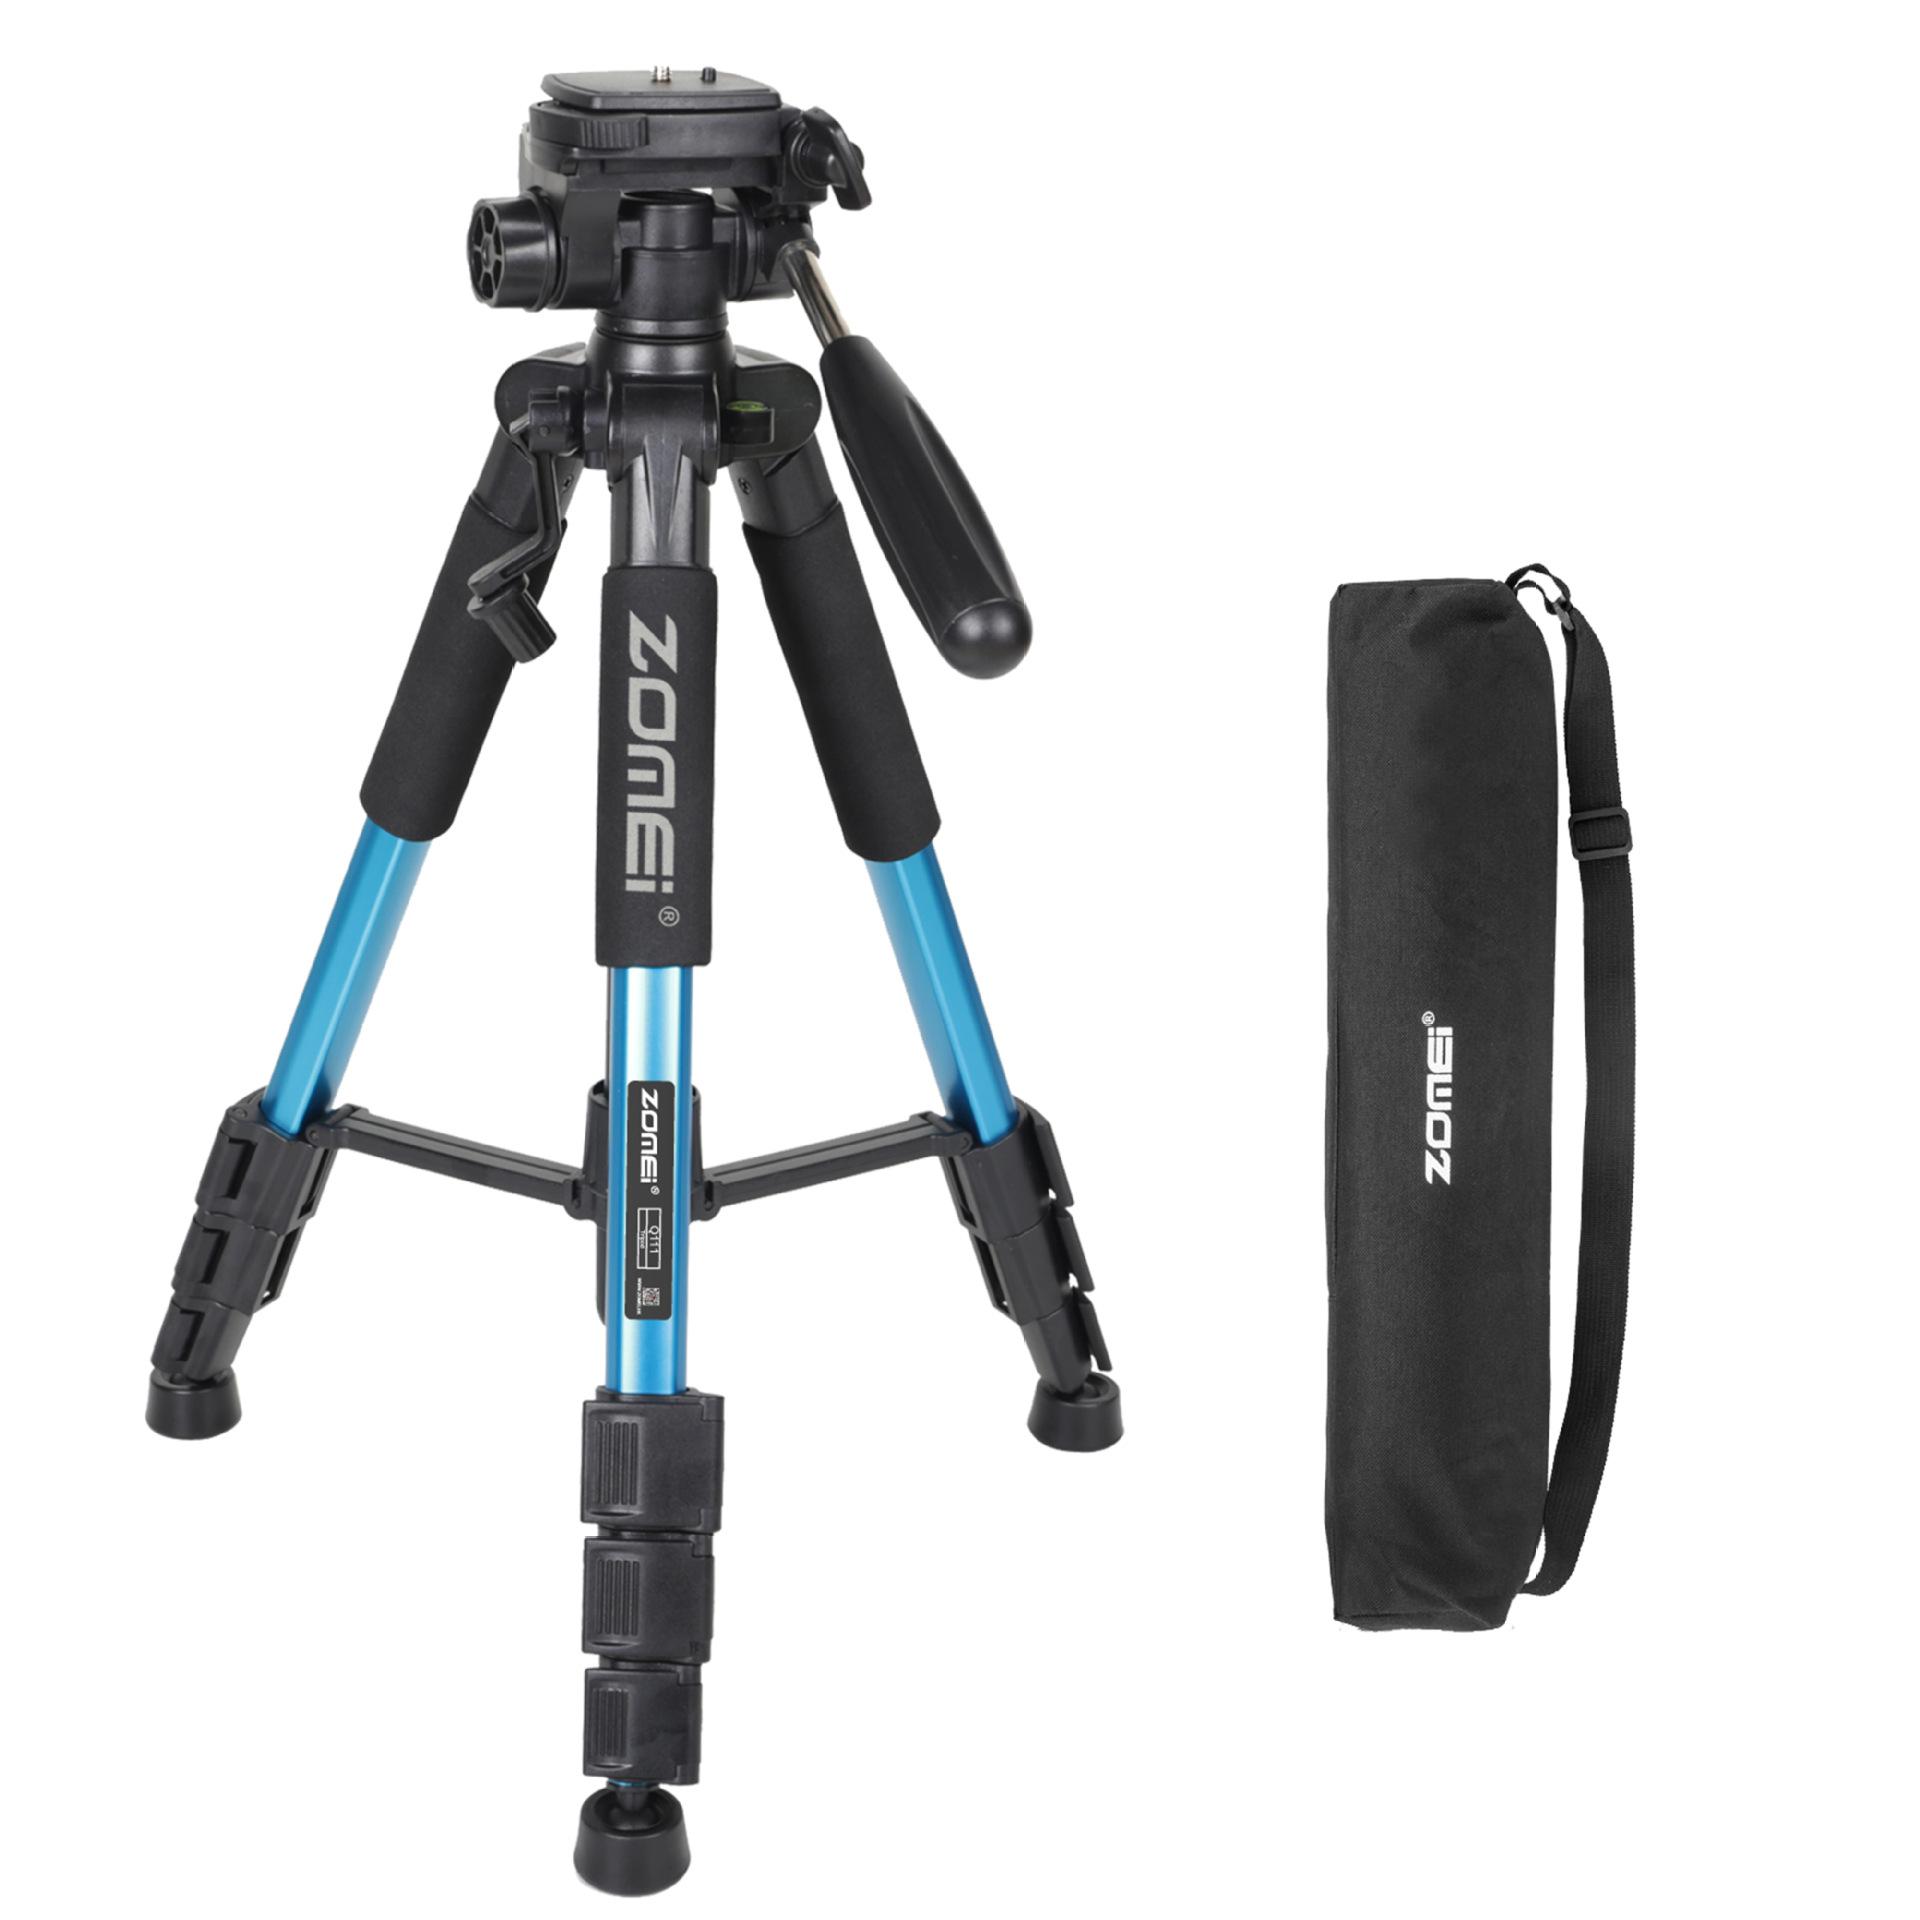 Mobile Phone Bracket Pro Aluminium Q111 Tripod for DSLR Camera Video Fill-in Light Bracket blue